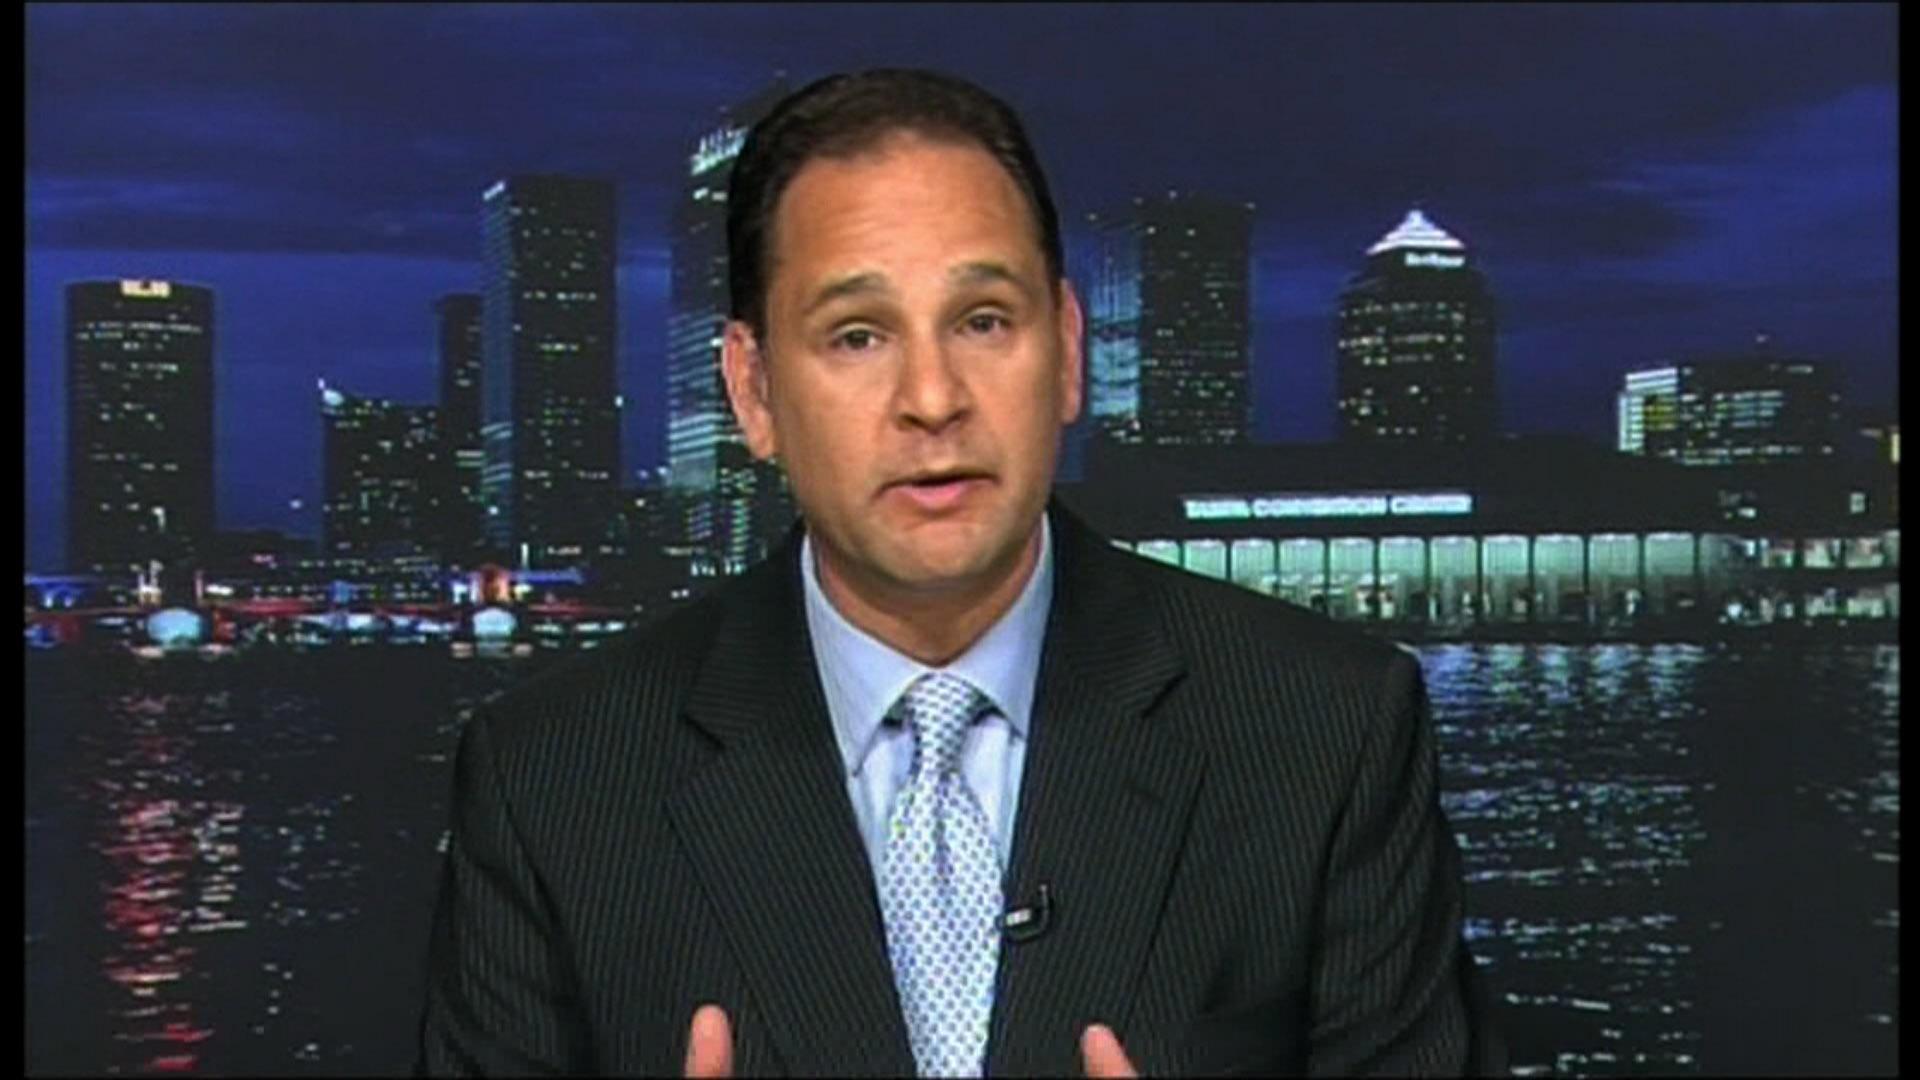 CBN's David Brody image